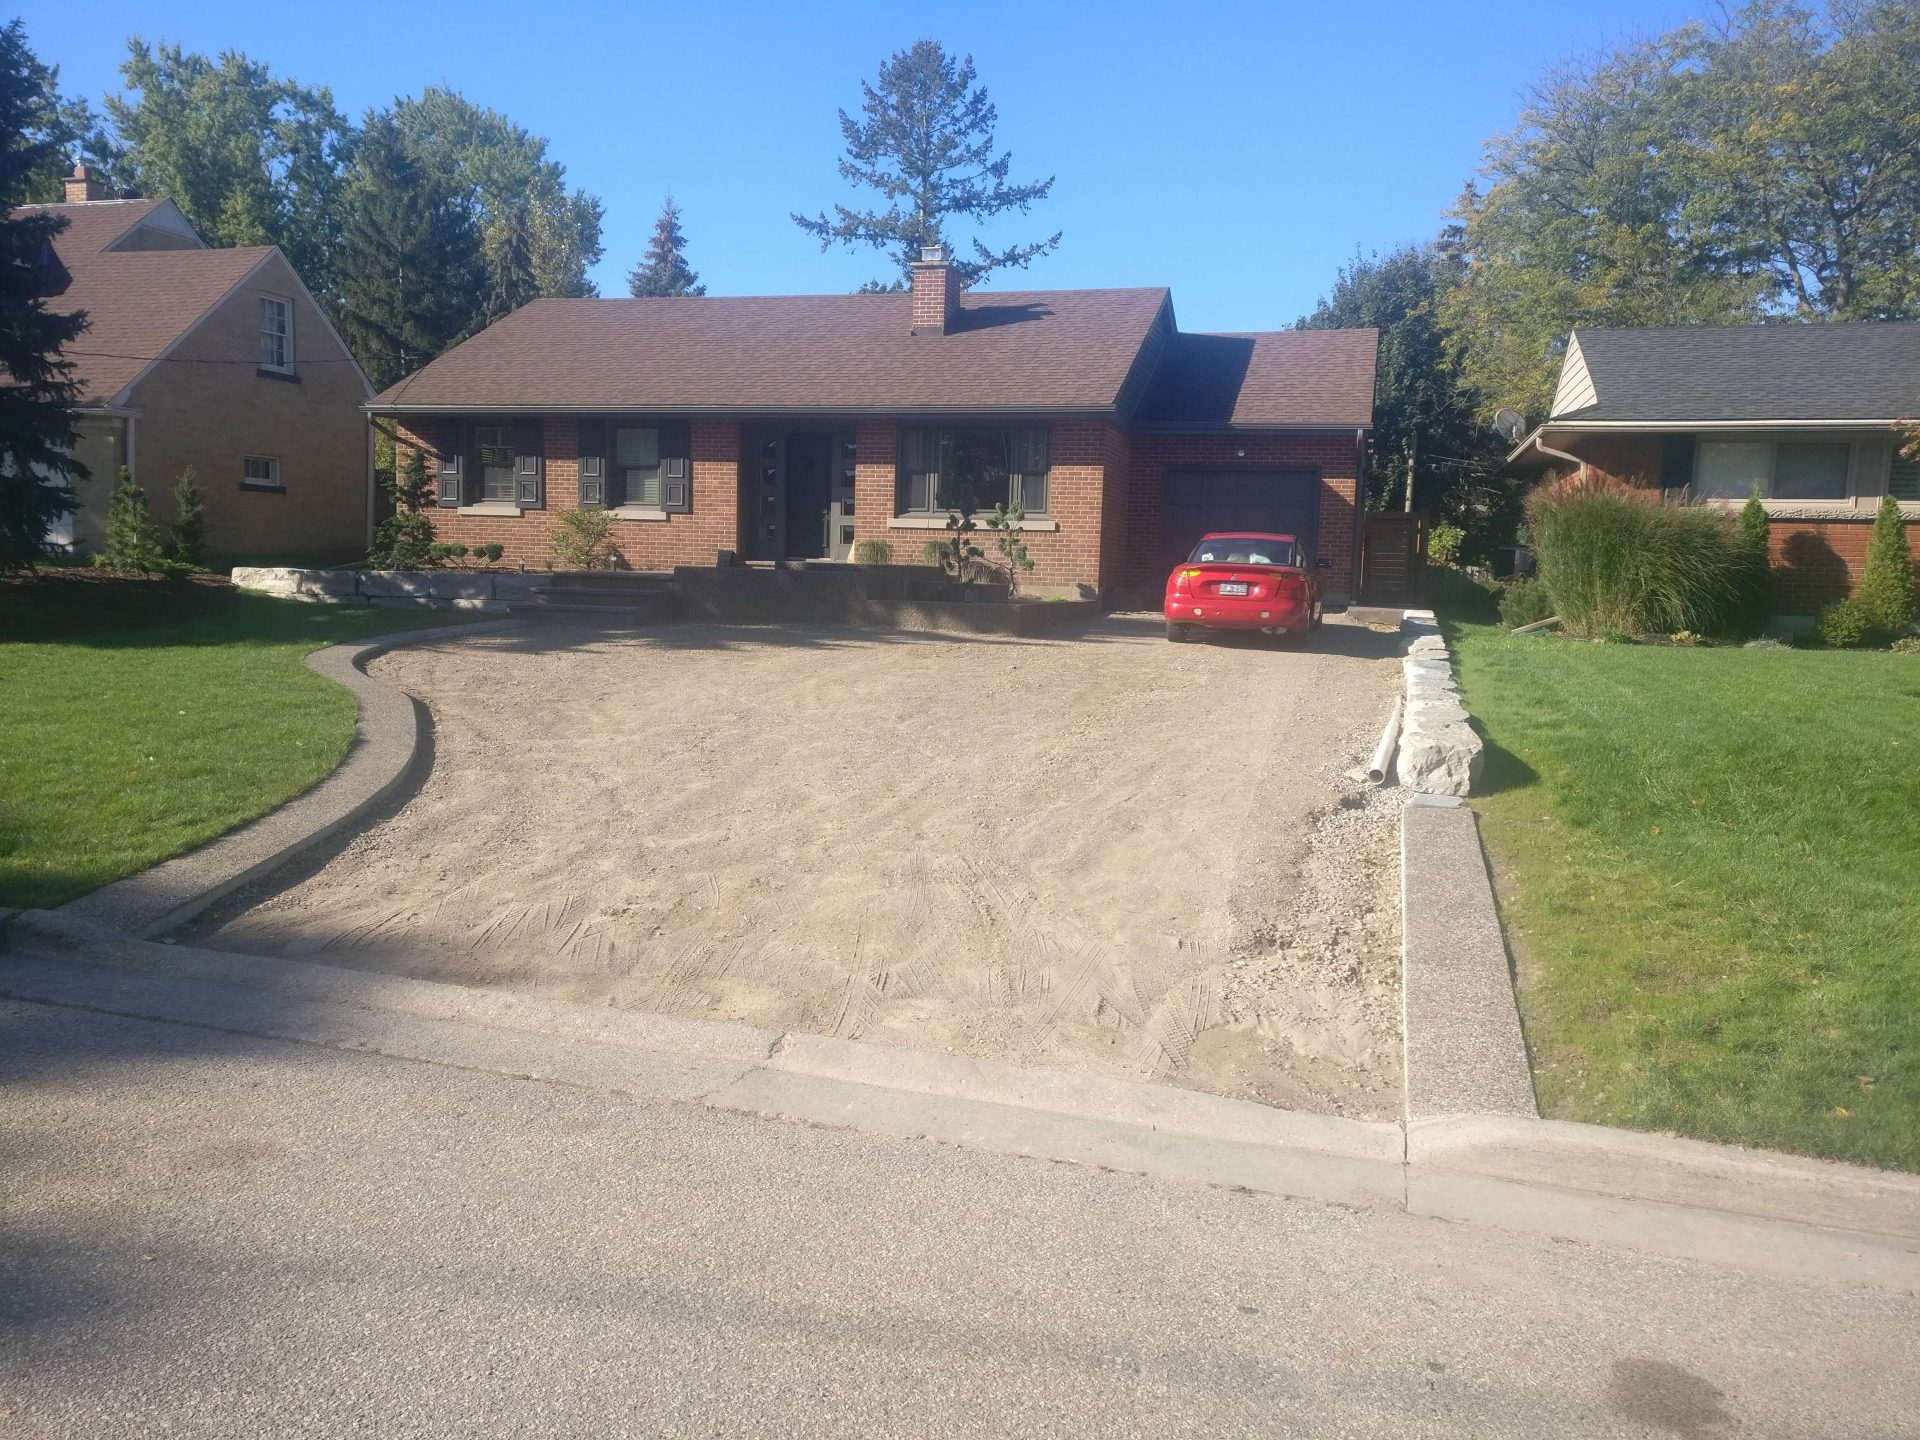 Unpaved gravel driveway